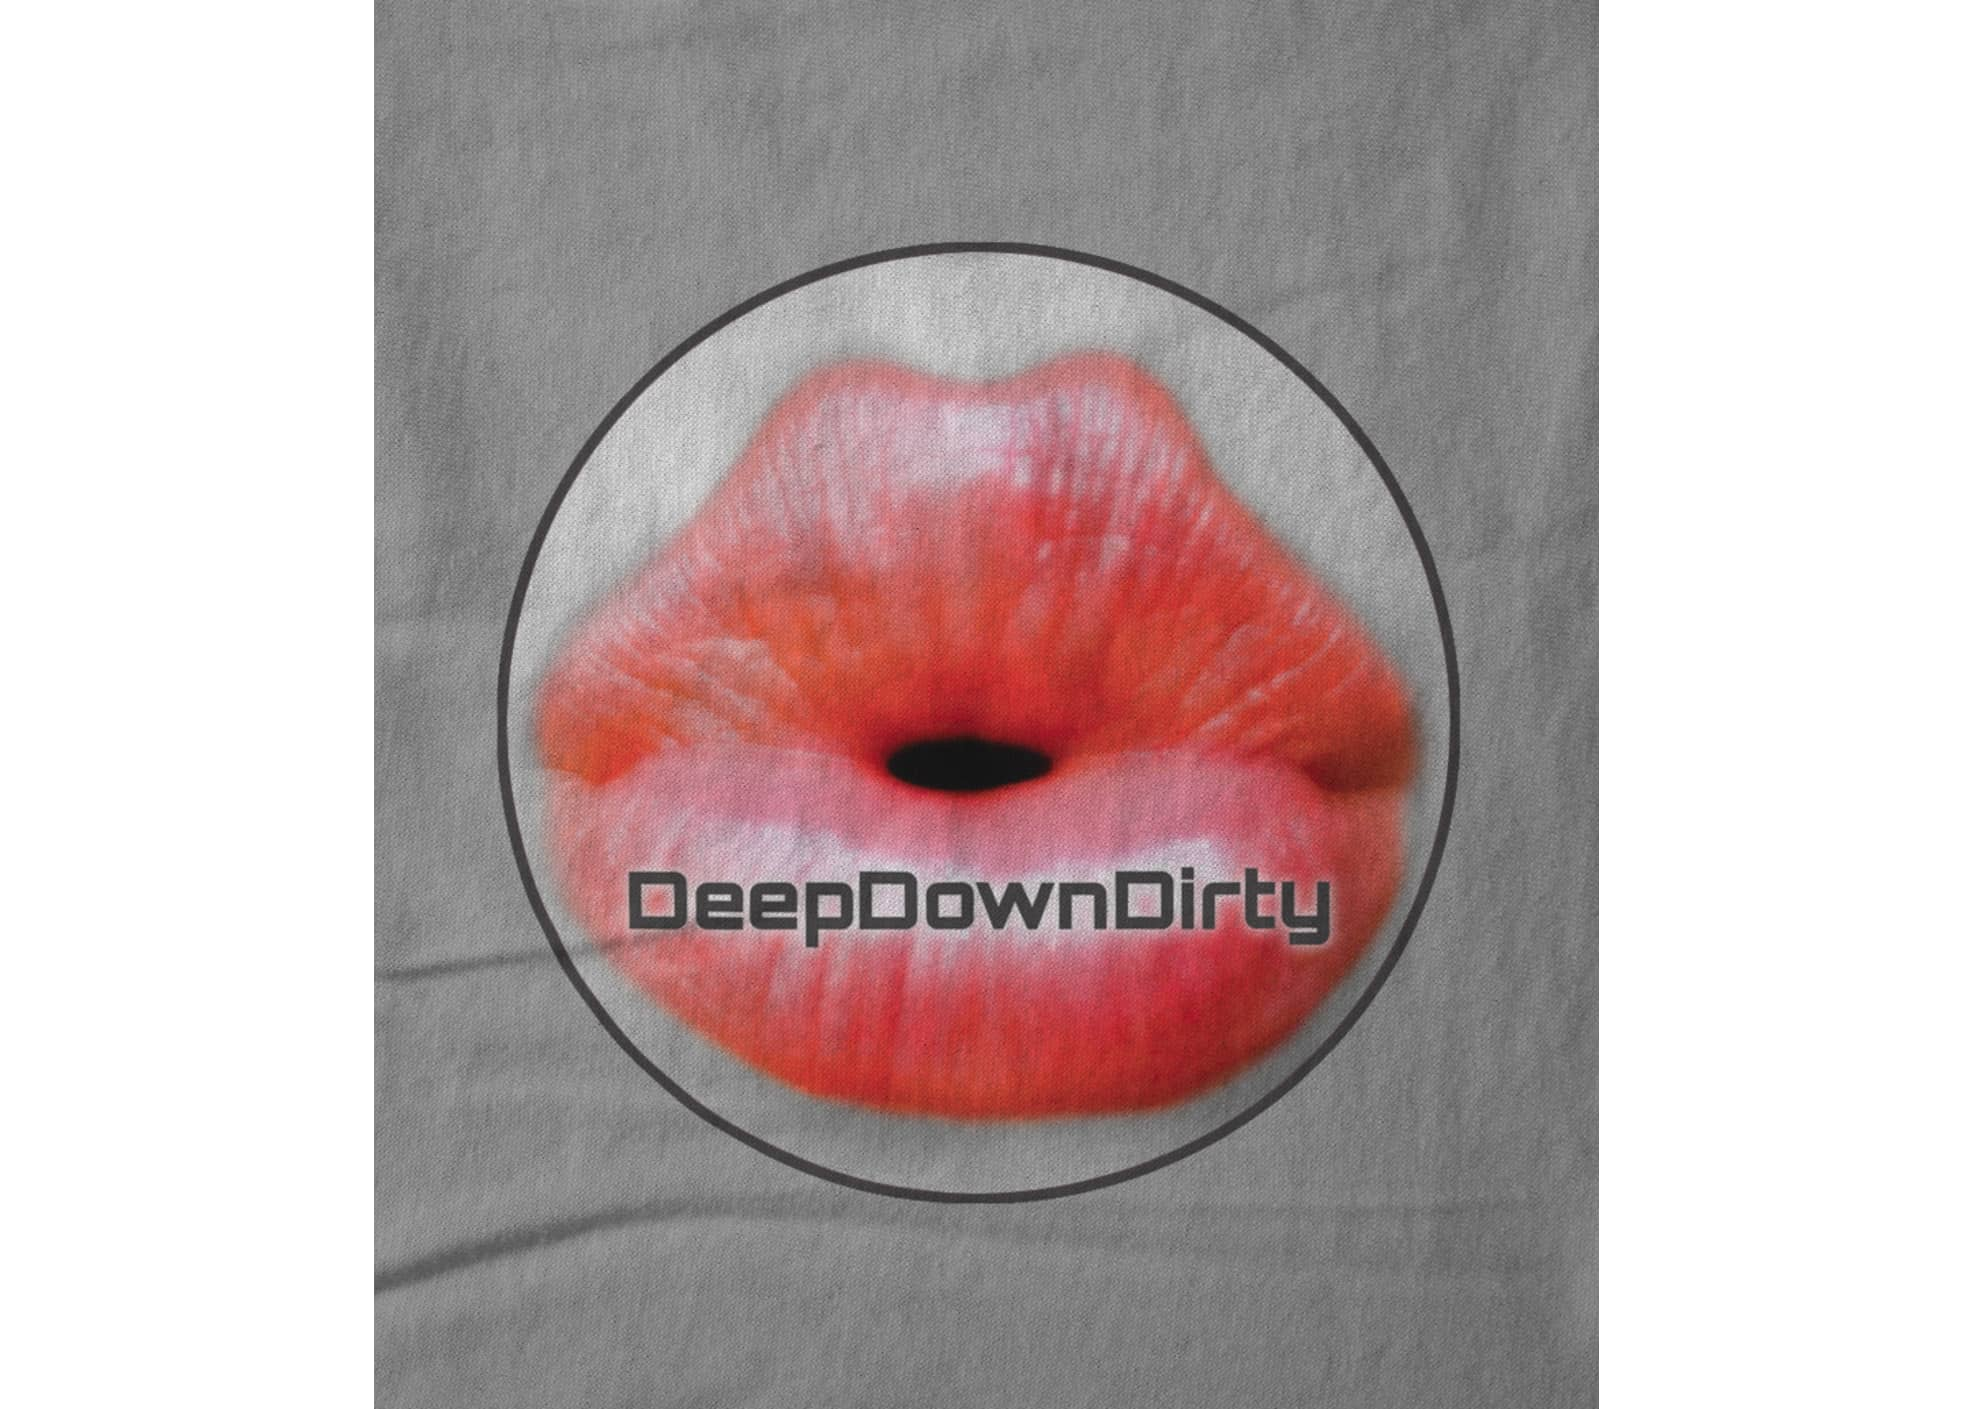 Deepdowndirty record label classic lips round 1522800105